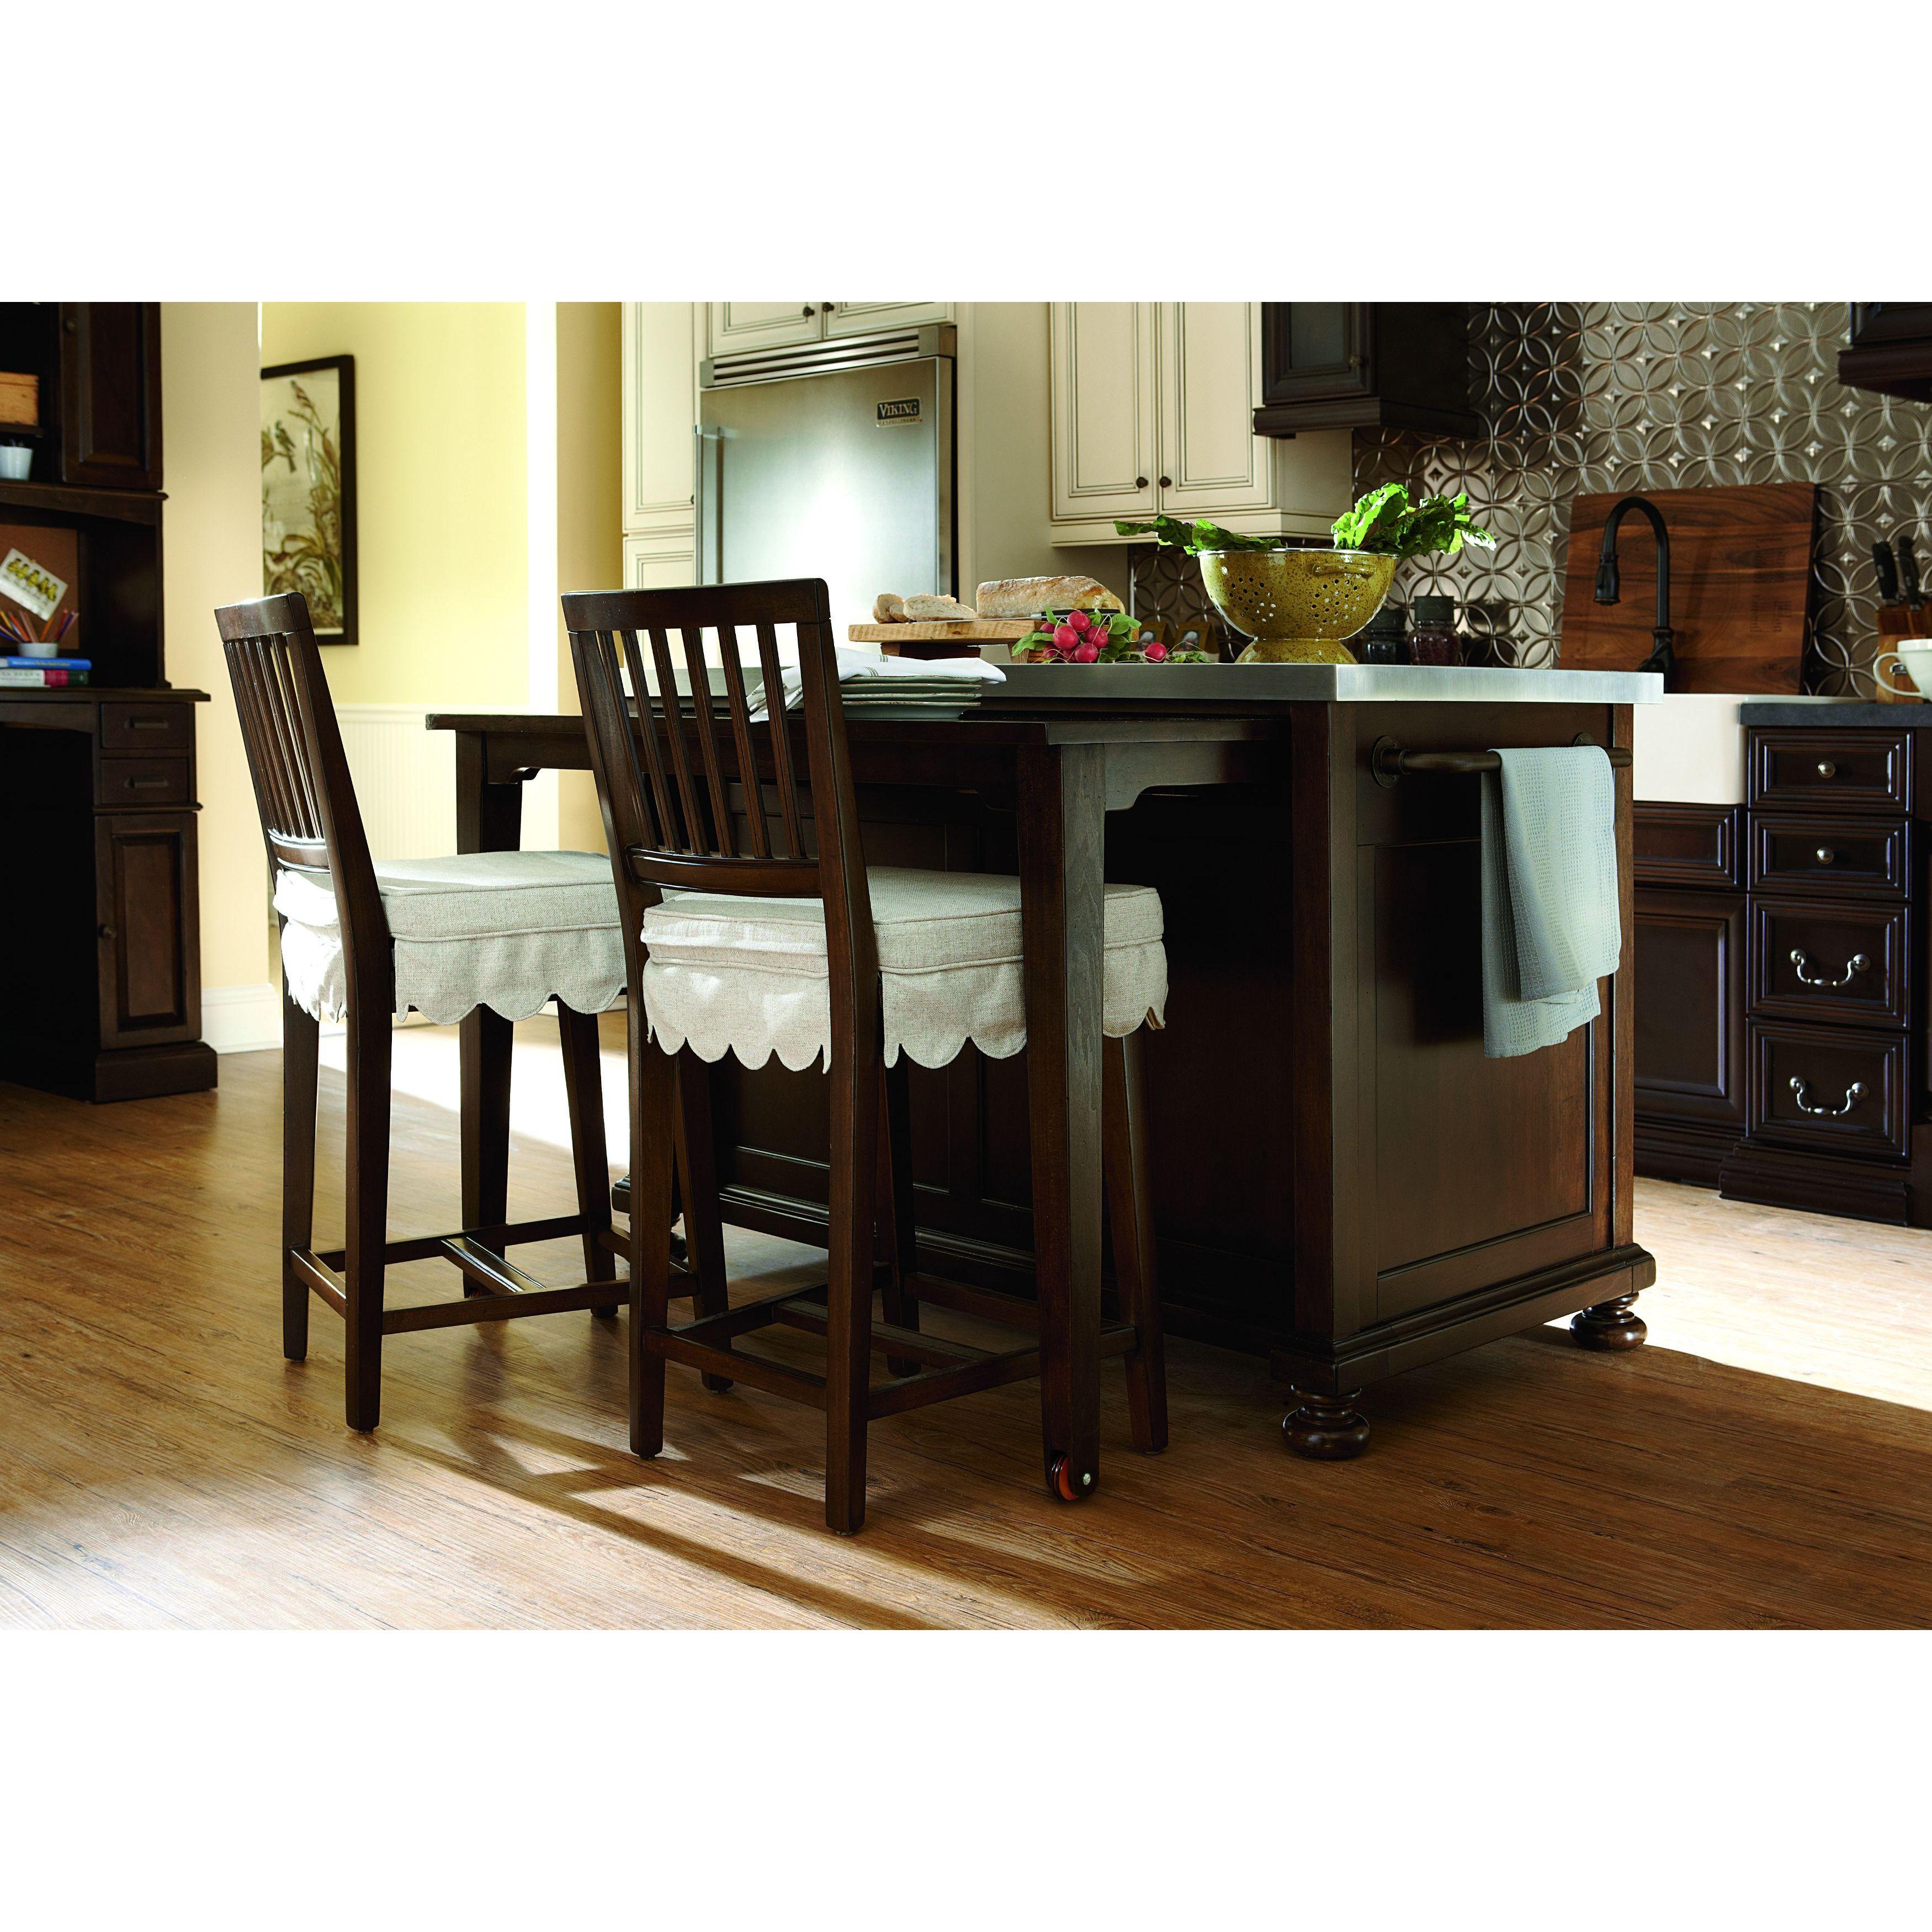 Simple Office Room Design, Shop Black Friday Deals On Paula Deen Home Kitchen Island Overstock 11552188